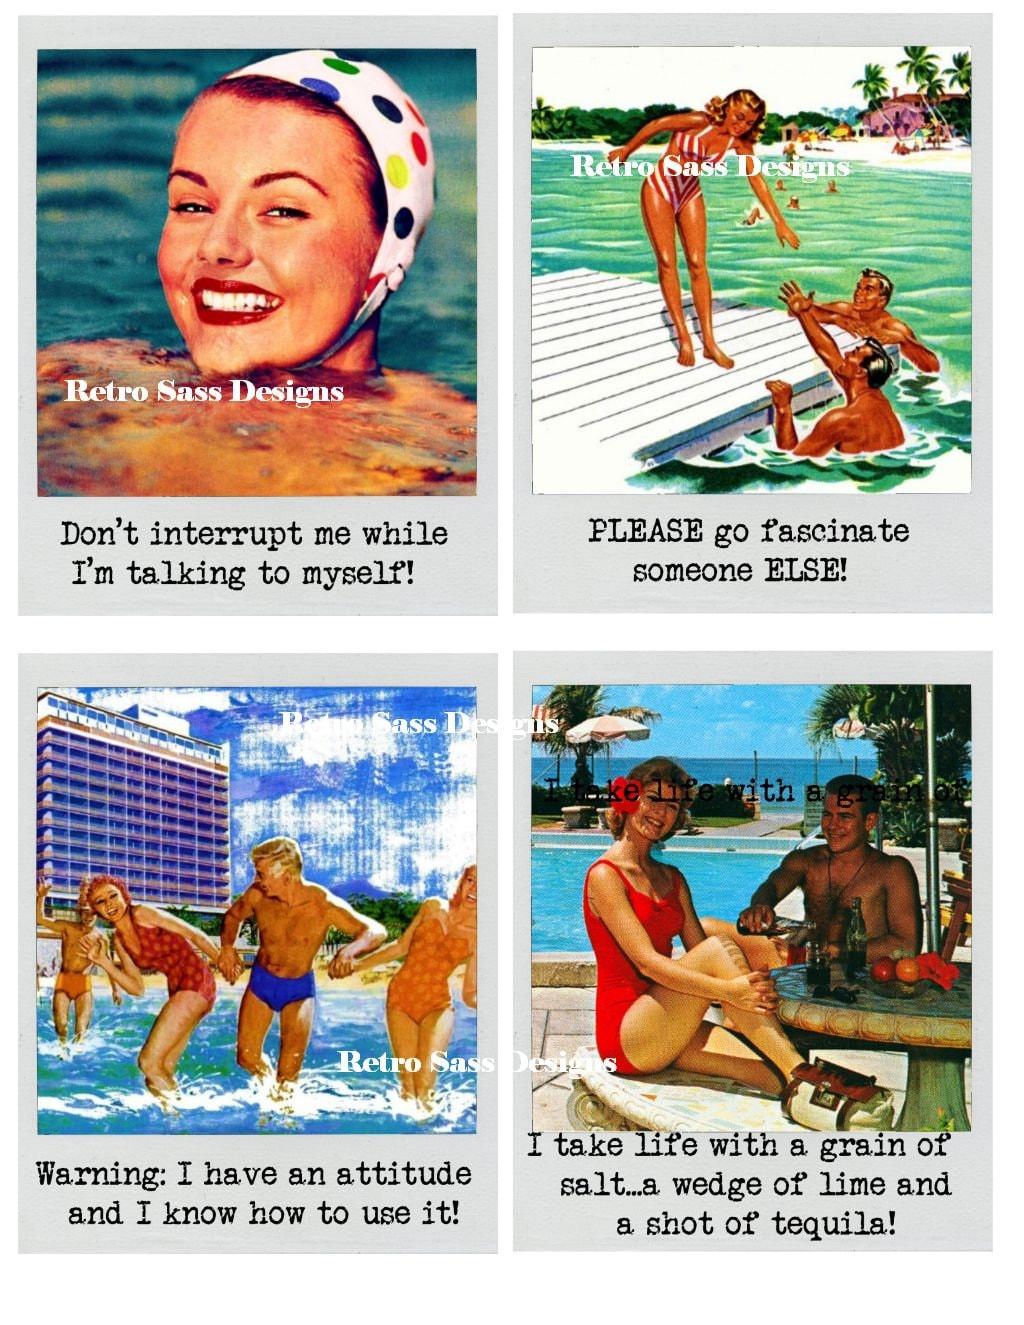 Retro-Roadtrip inspirieren Polaroid Rahmen Postkarte oder